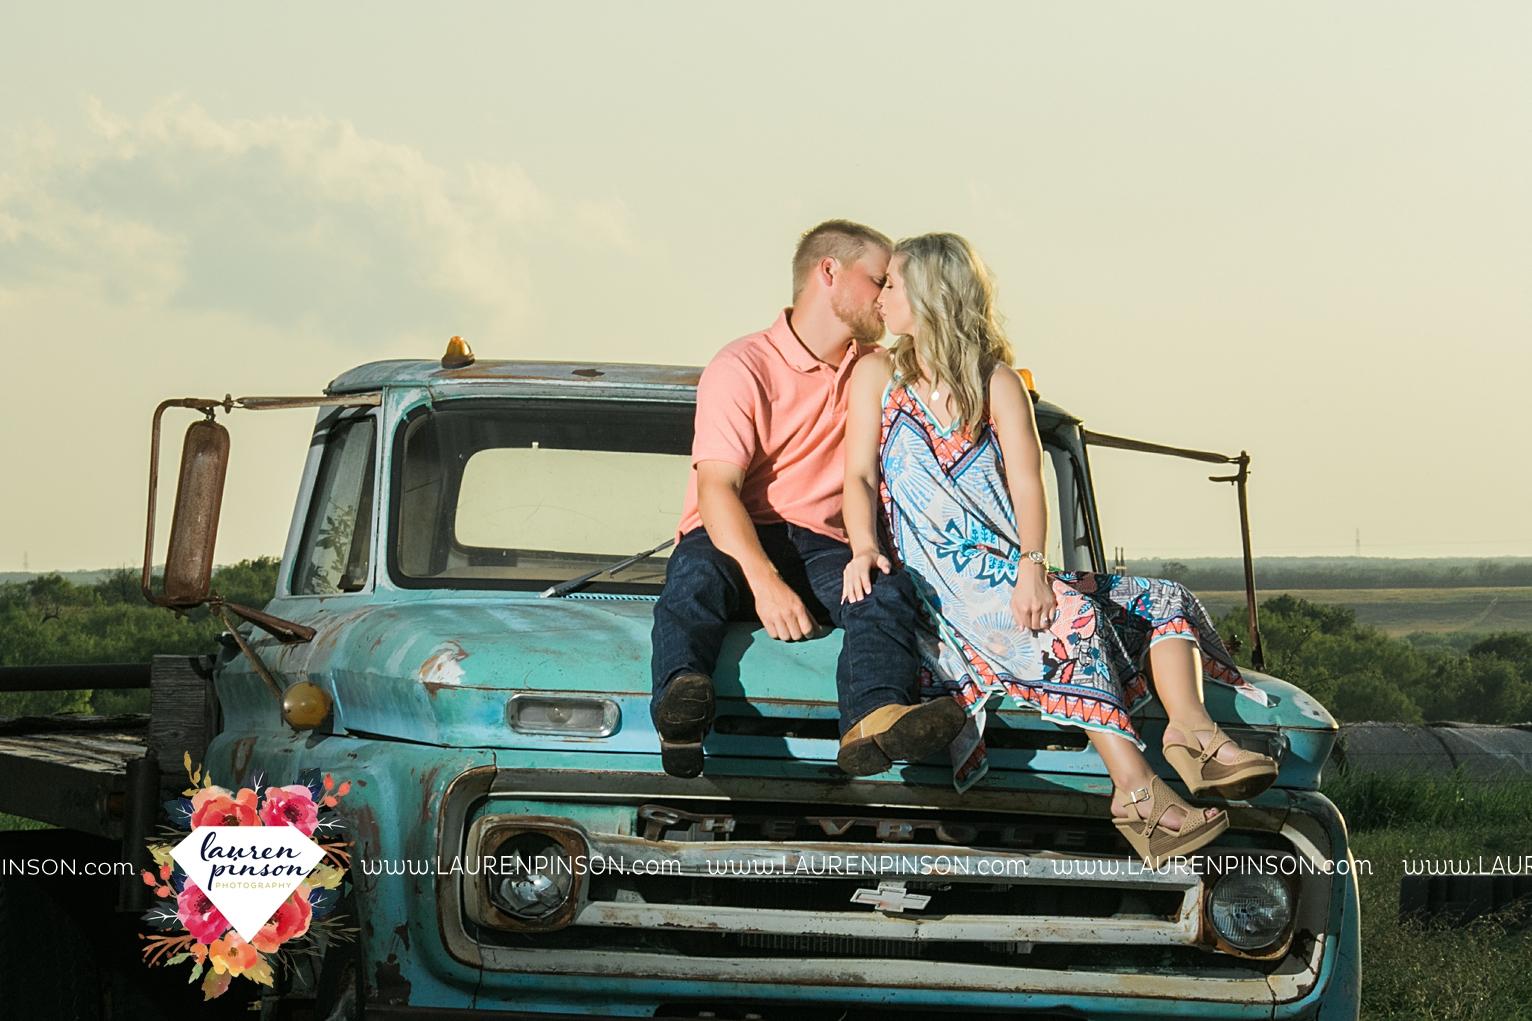 wichita-falls-texas-wedding-photographer-scotland-texas-engagement-session-country-barn-field-windthorst_2750.jpg